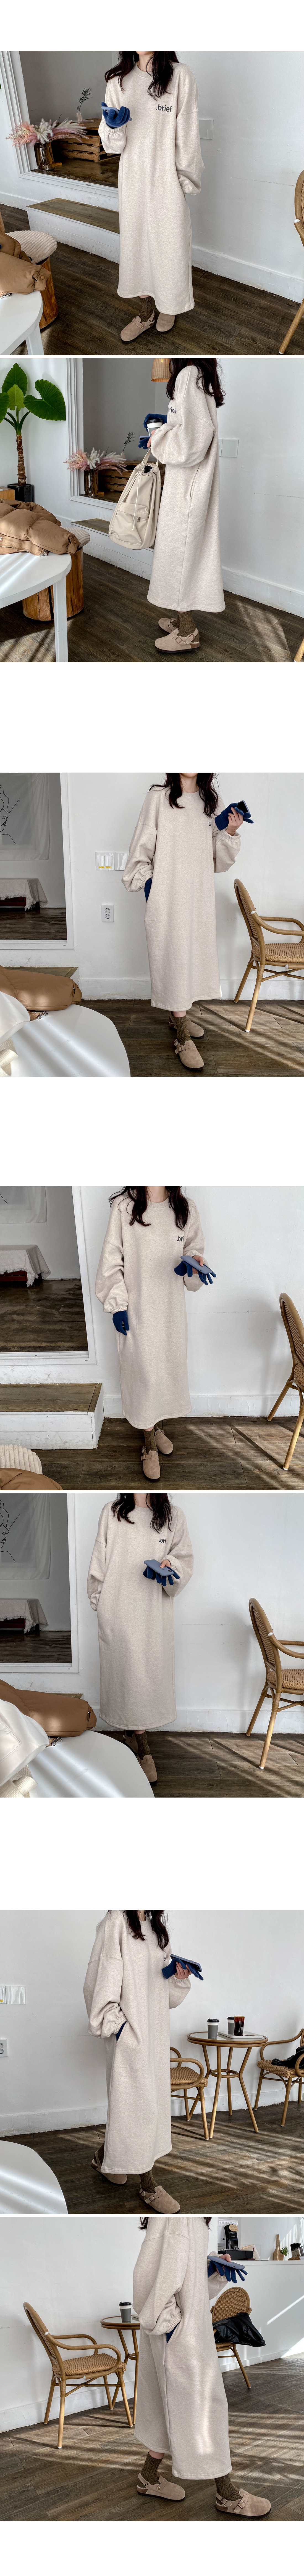 Briefs brushed long dress